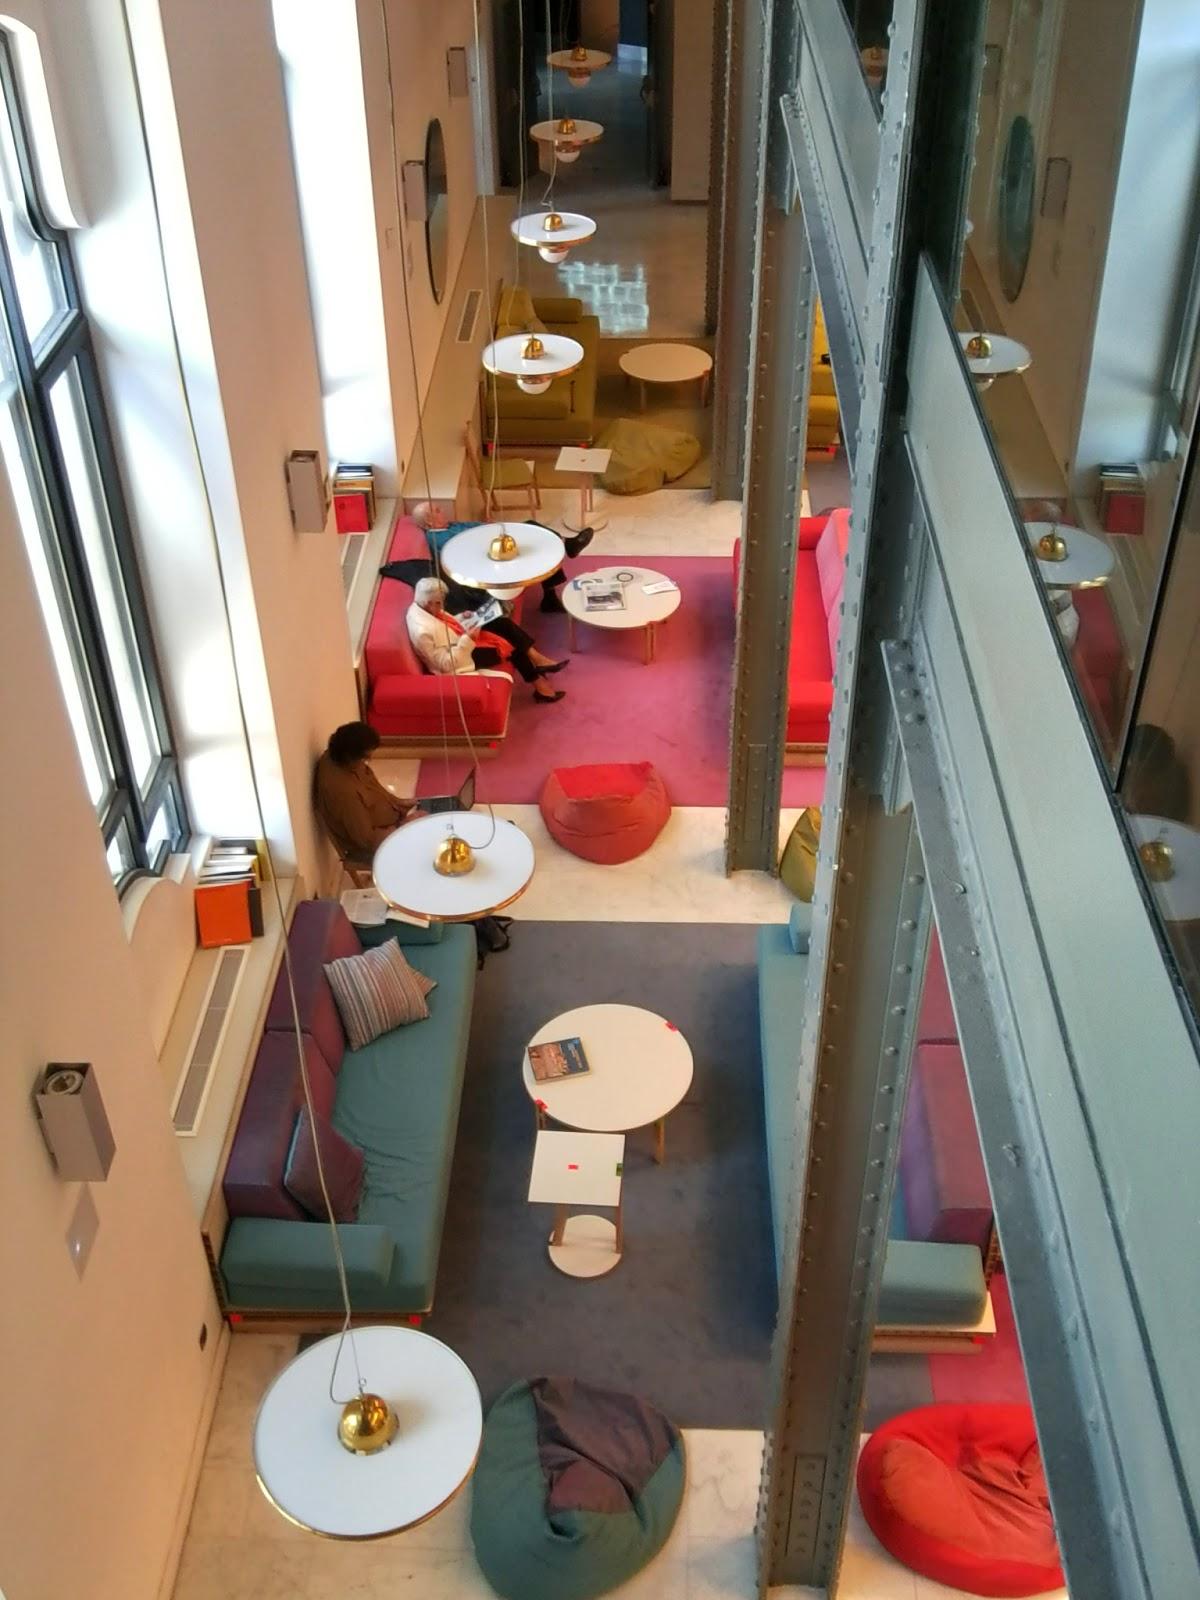 Centrocentro, Exposiciones Madrid, Blogs de Arte, Voa-Gallery, Yvonne Brochard,